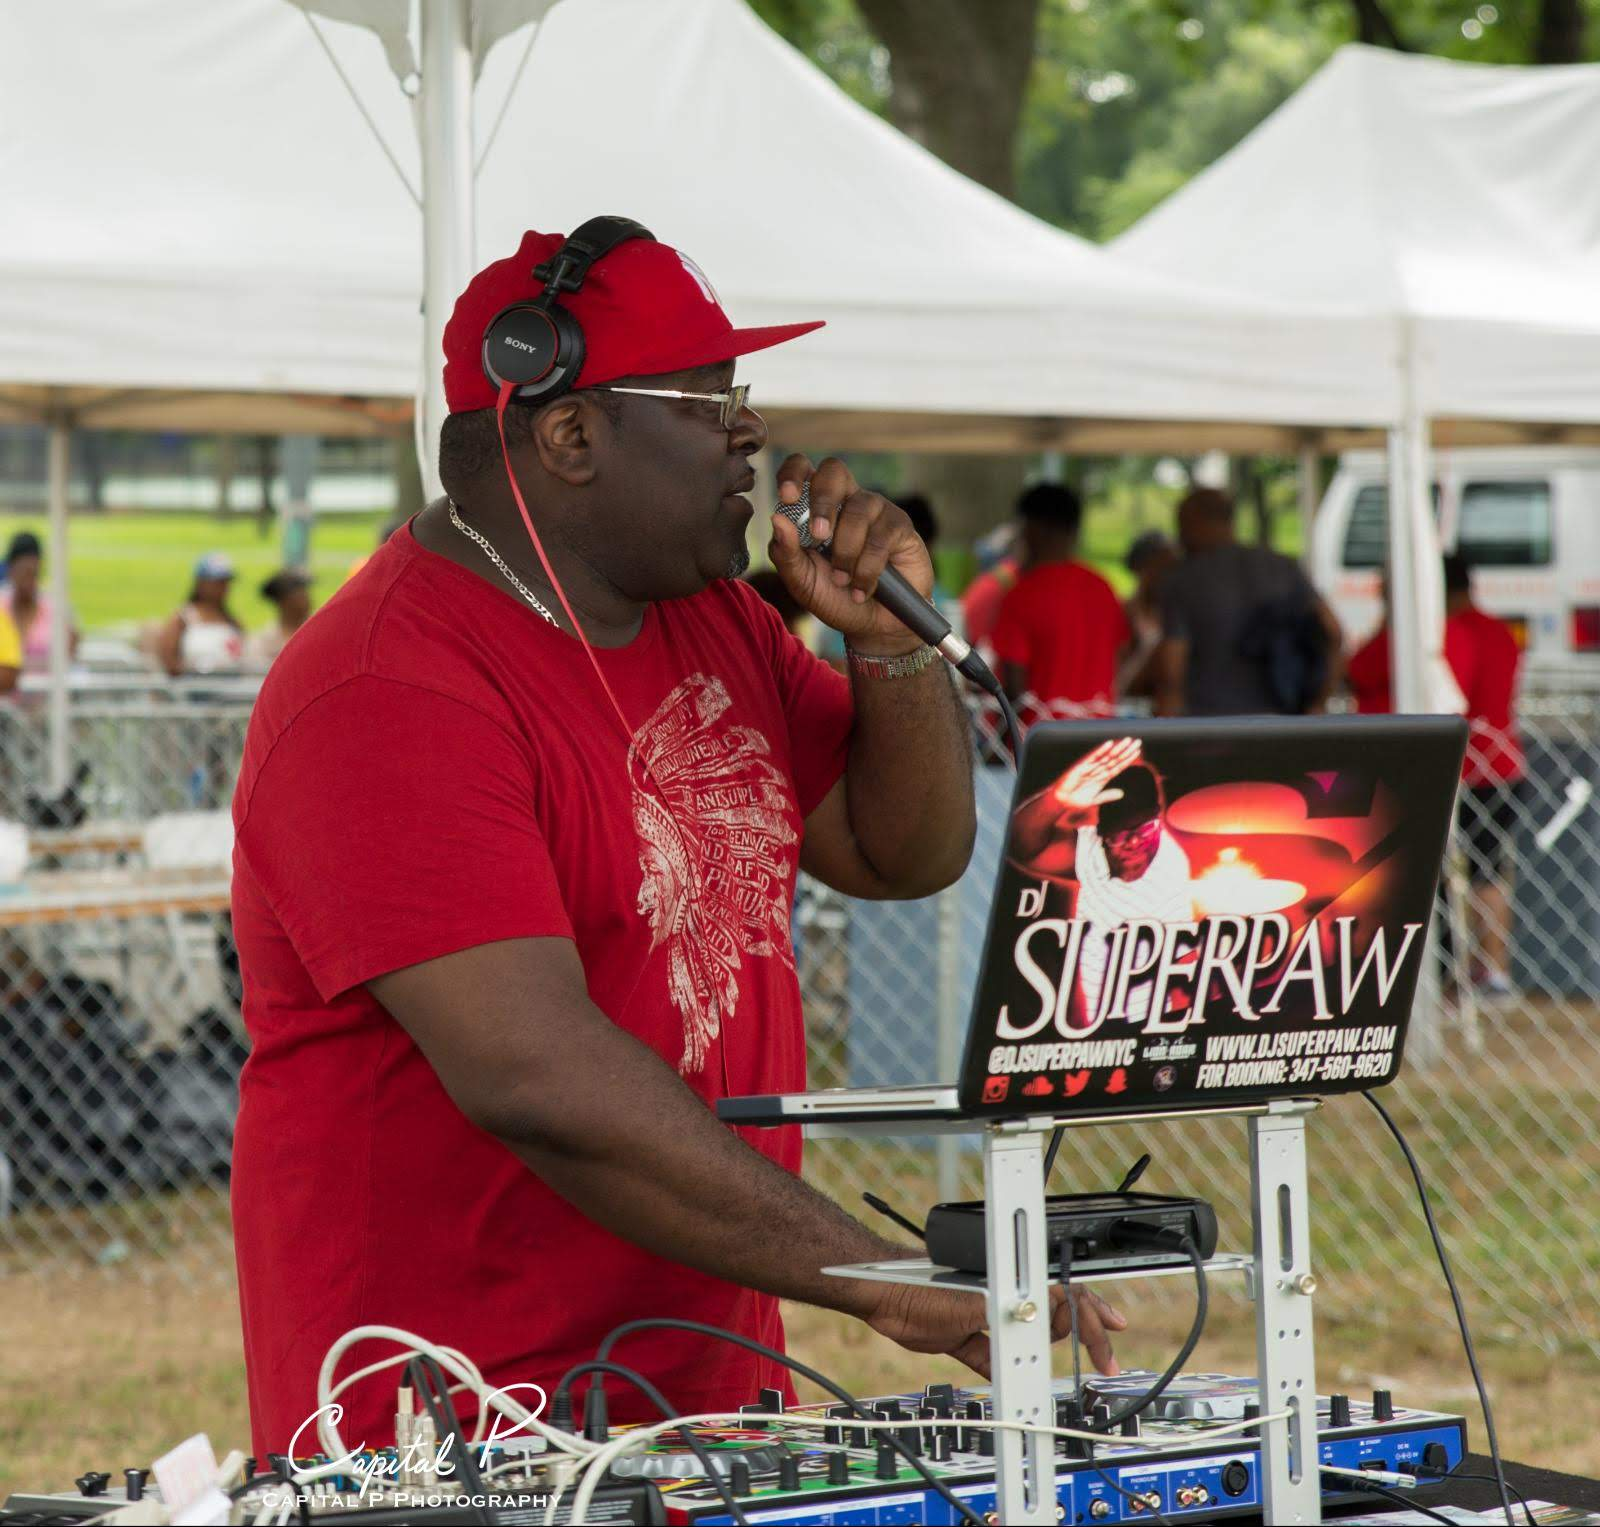 terGirl Marketing - DJ SuperPaw